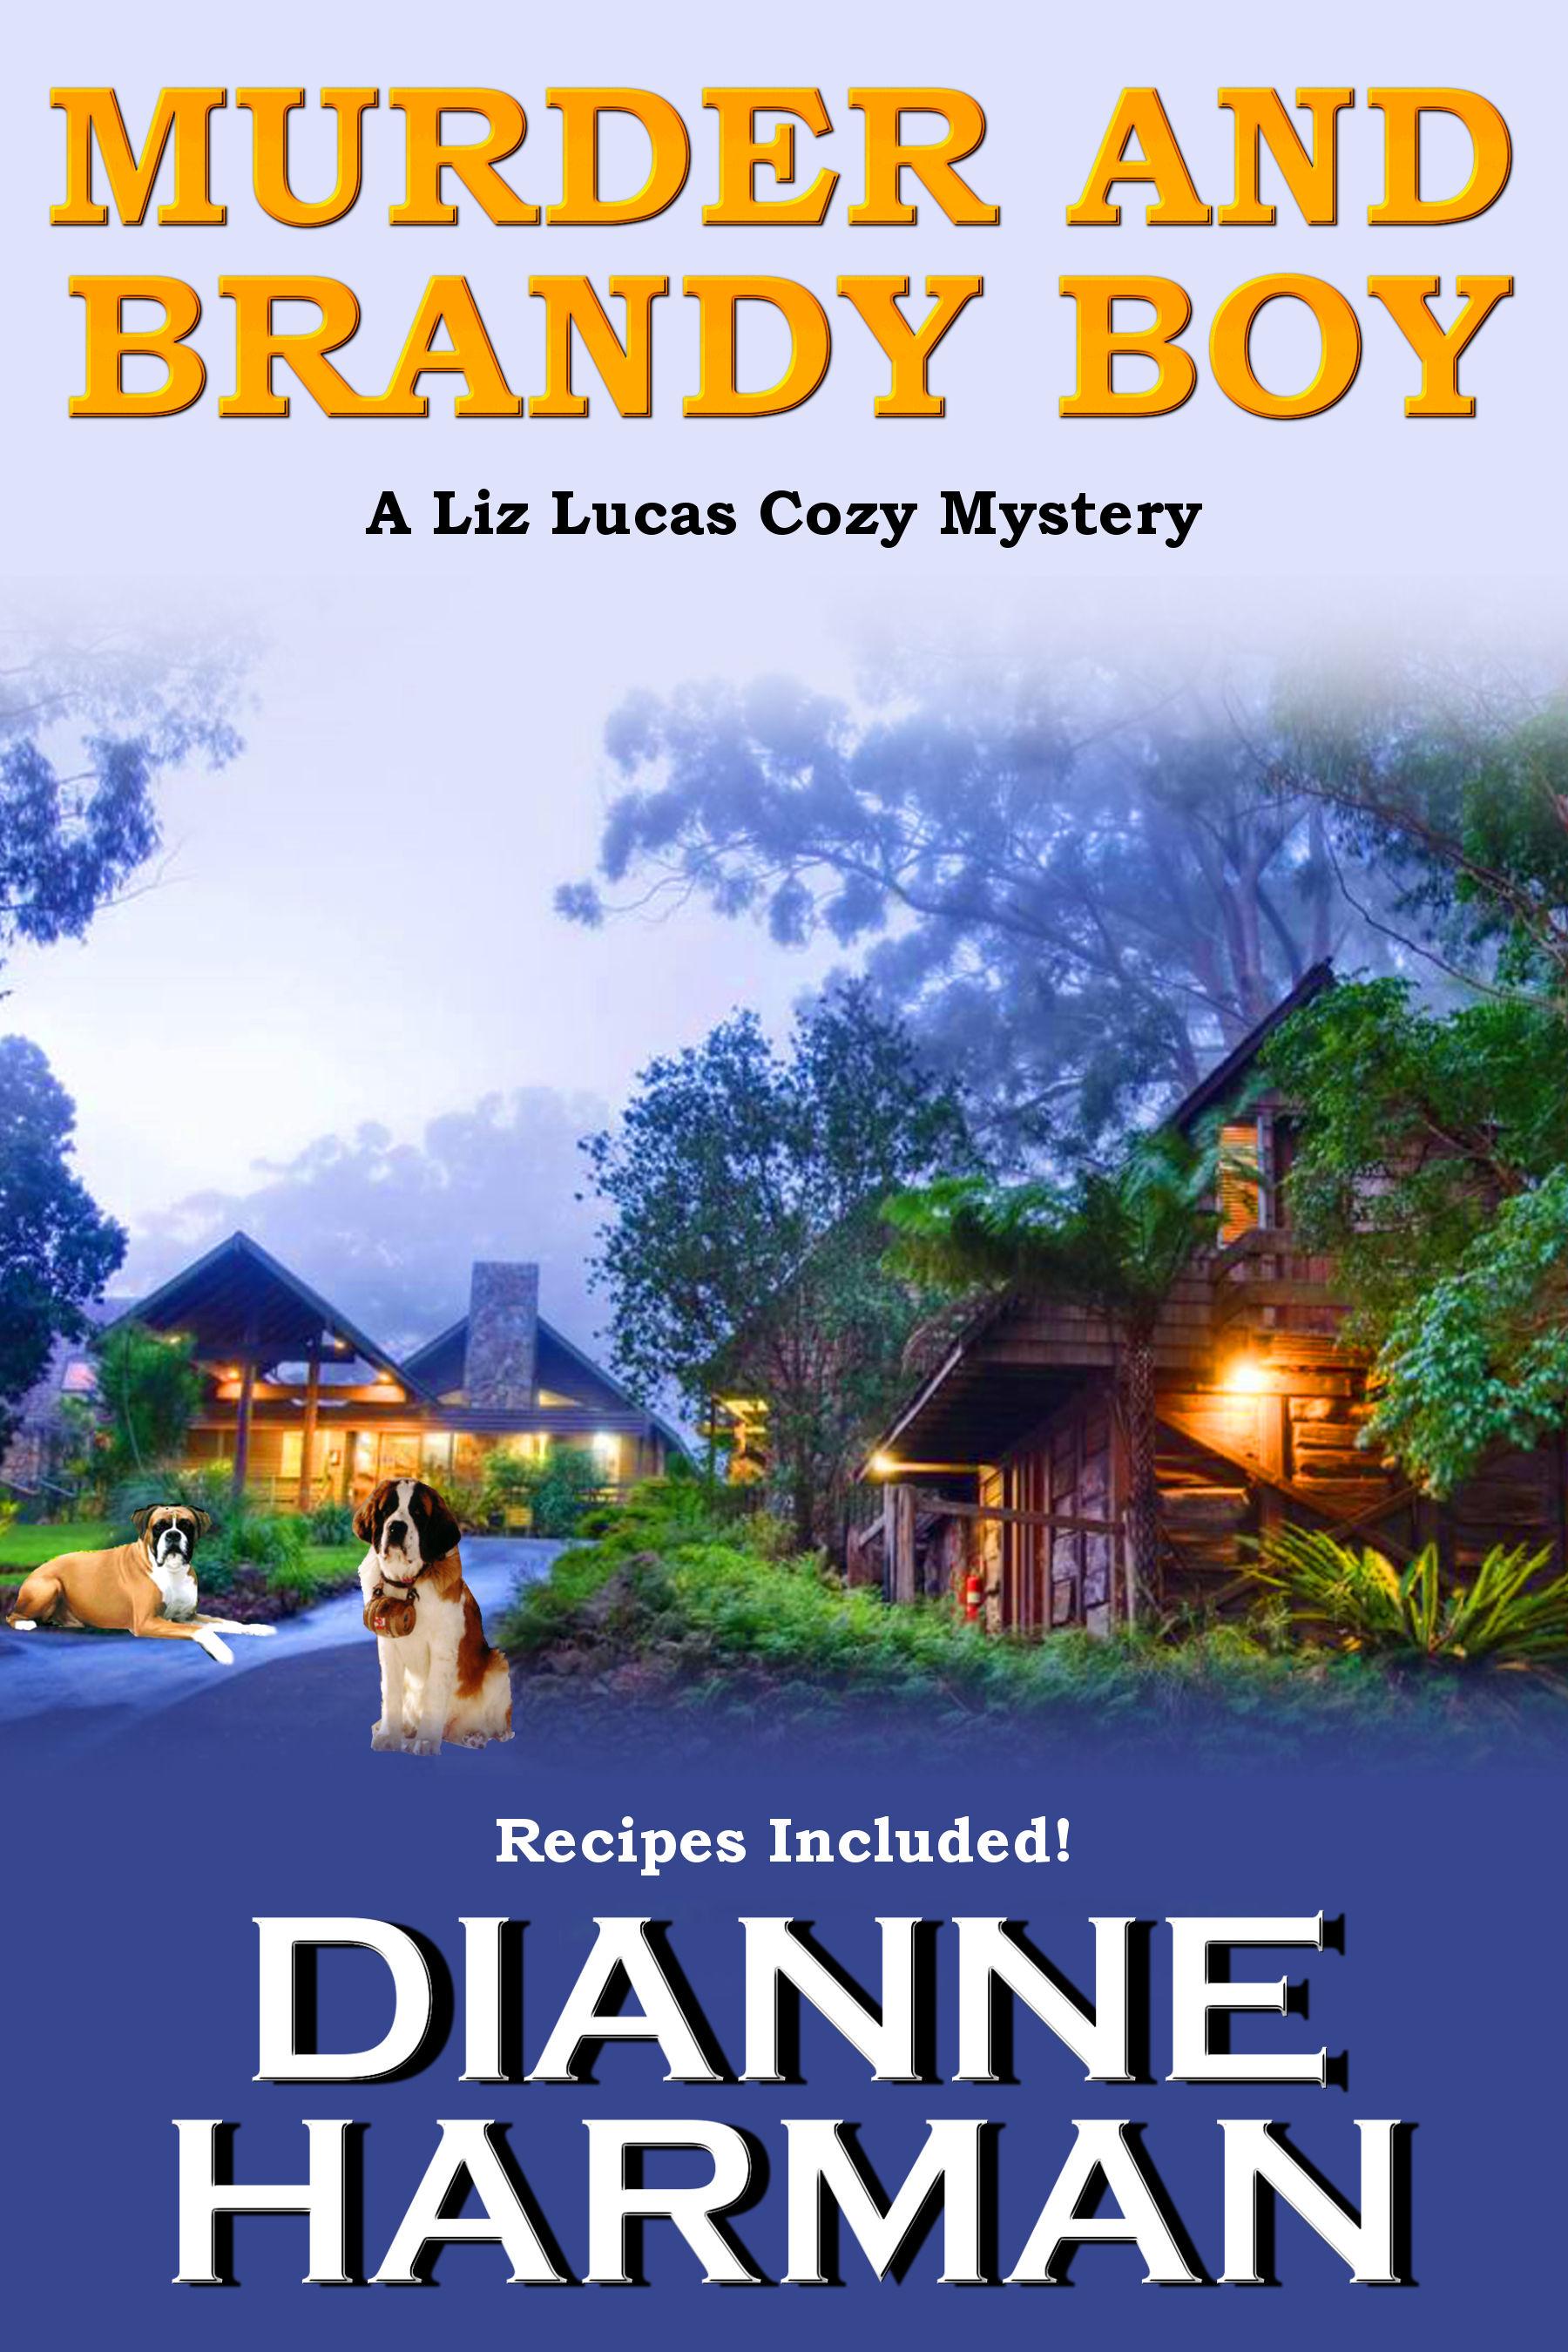 Murder Goes to Church (A Little Lukas Cozy Murder Mystery)